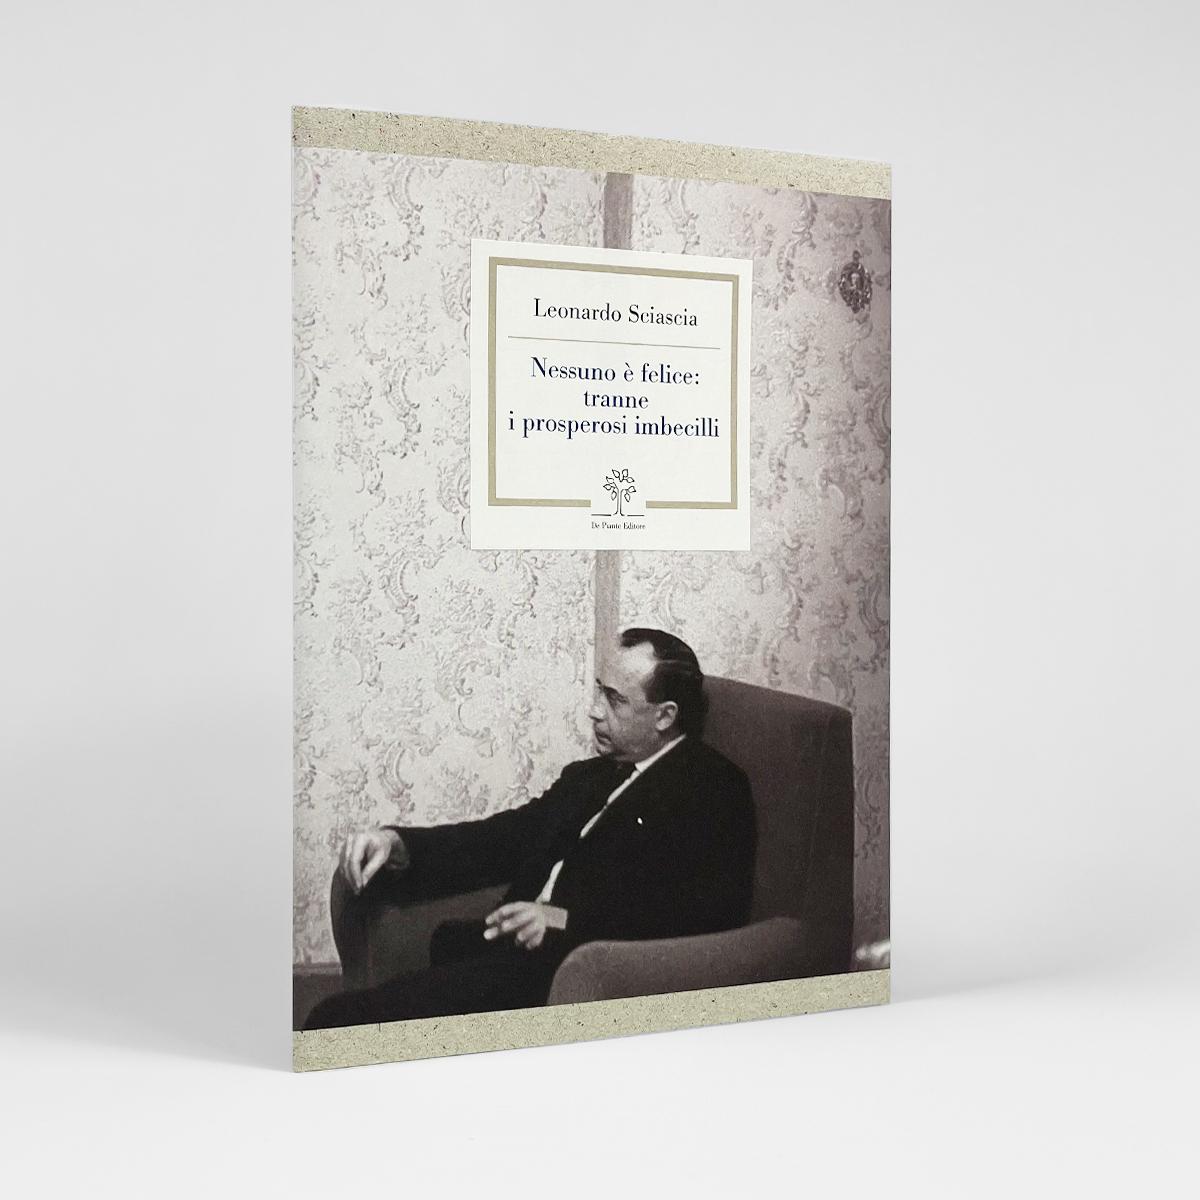 Leonardo Sciascia - Nessuno è felice: tranne i prosperosi imbecilli